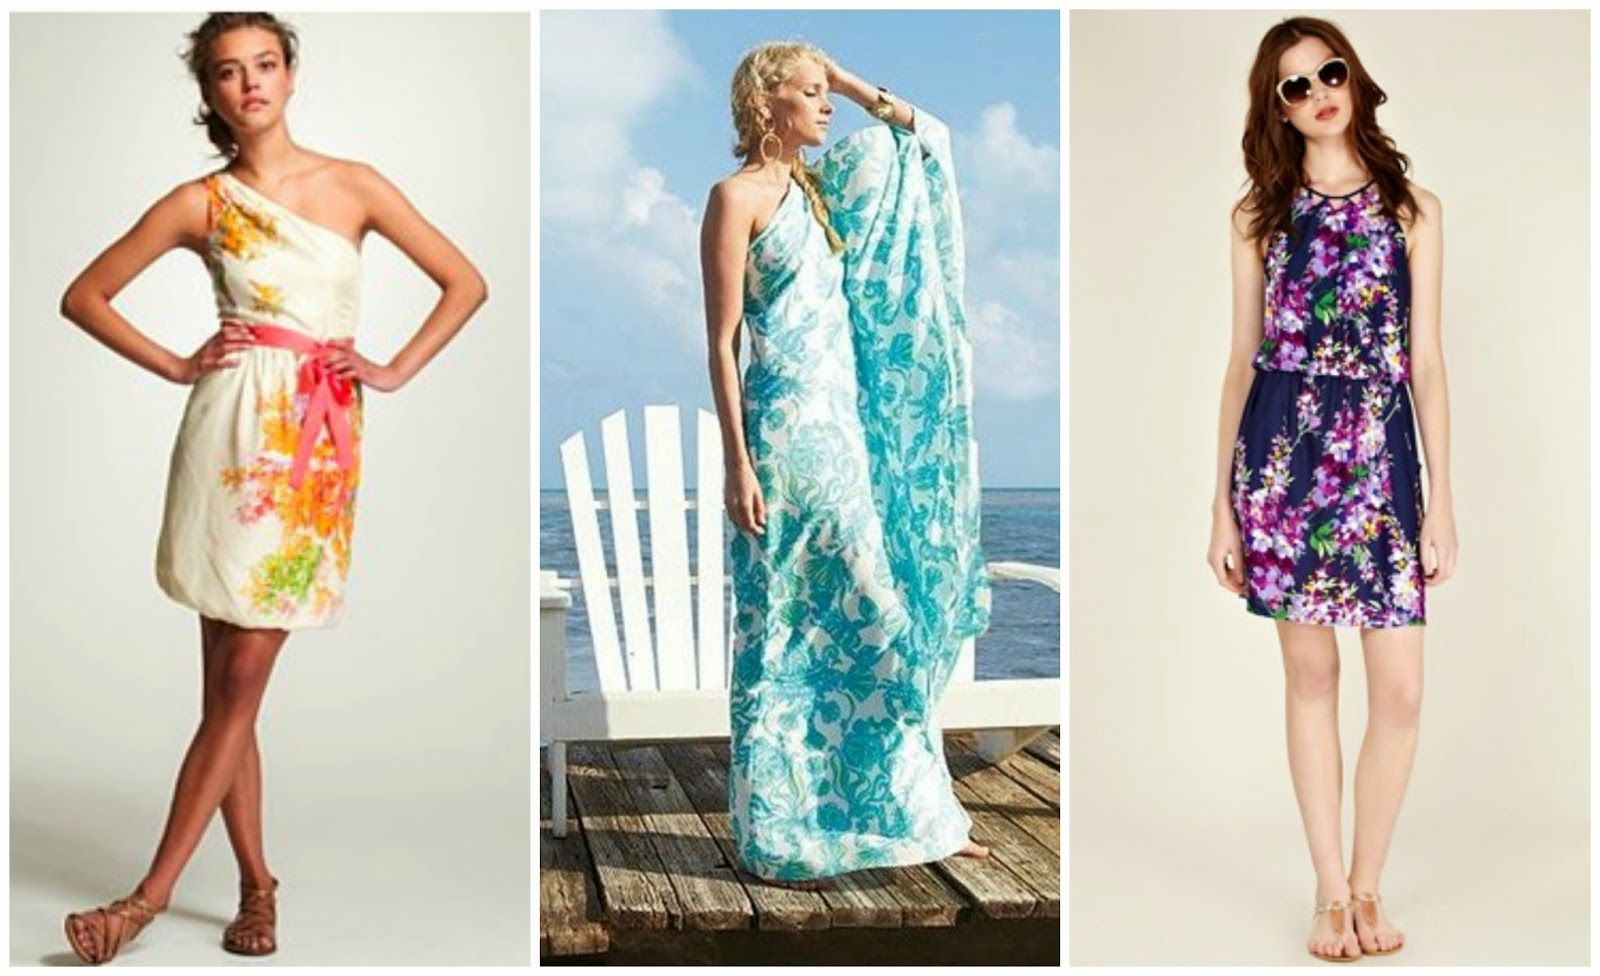 Beach Wedding guest | Le nozze di Livia | Pinterest | Beach wedding ...